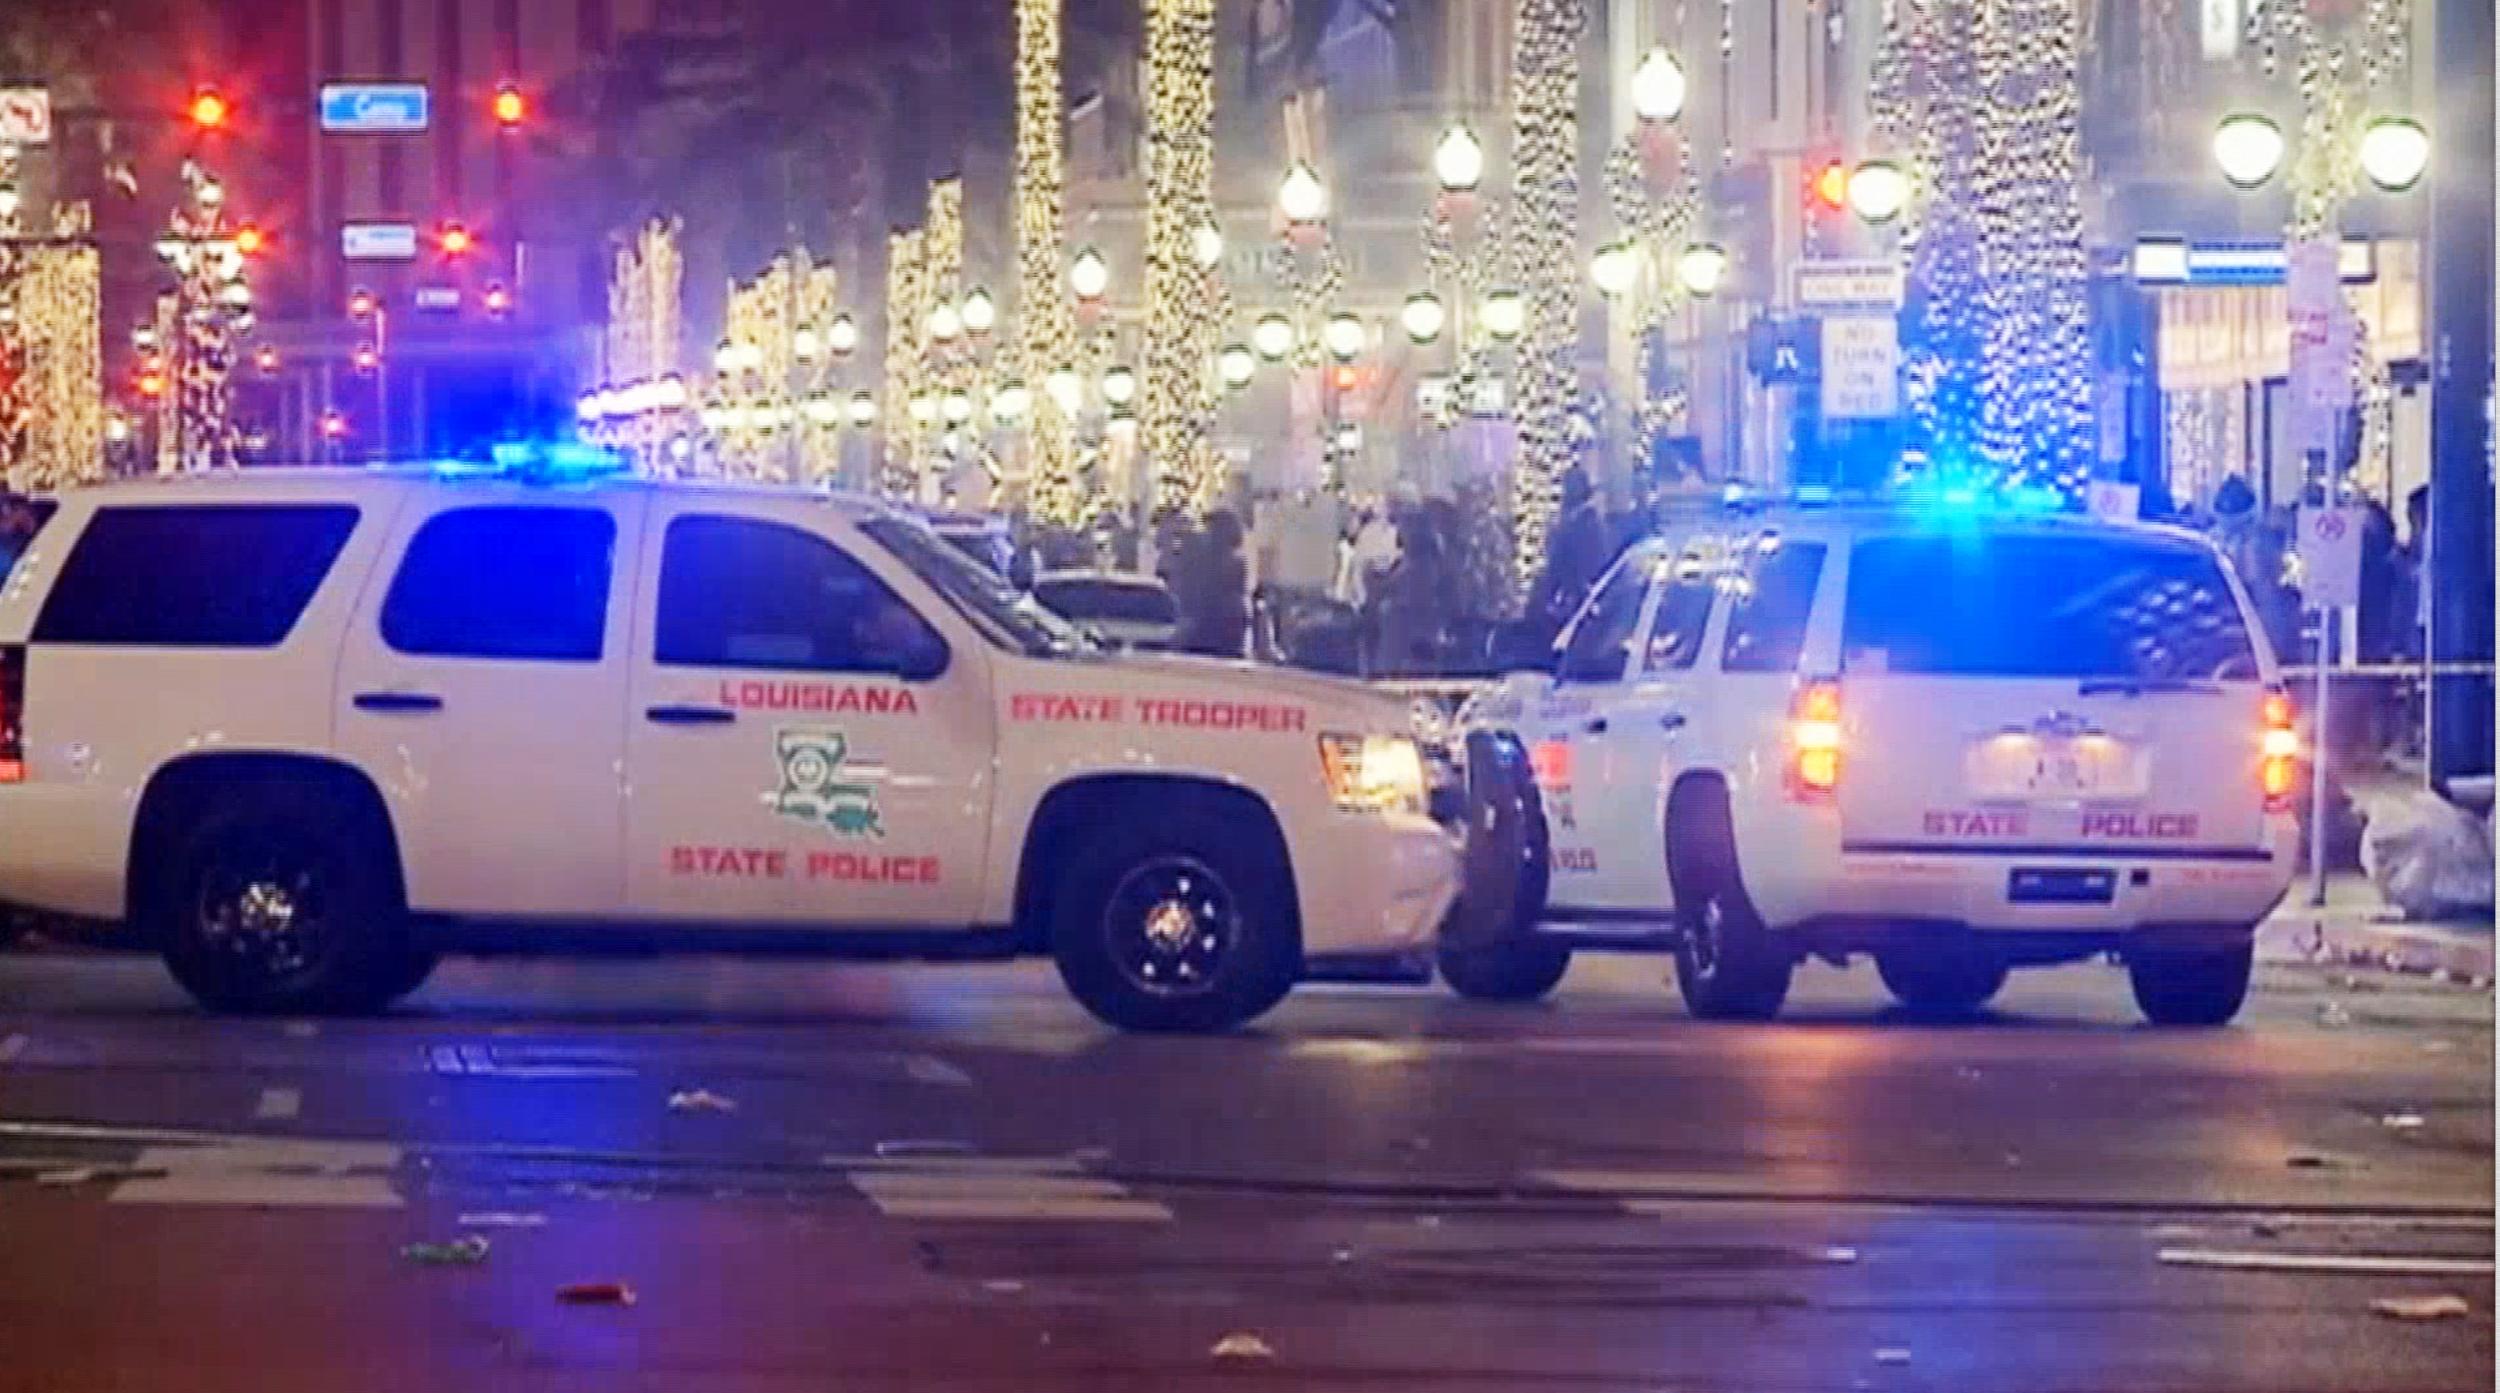 Bourbon Street New Orleans Shooting Leaves 1 Dead 9 Hurt Police